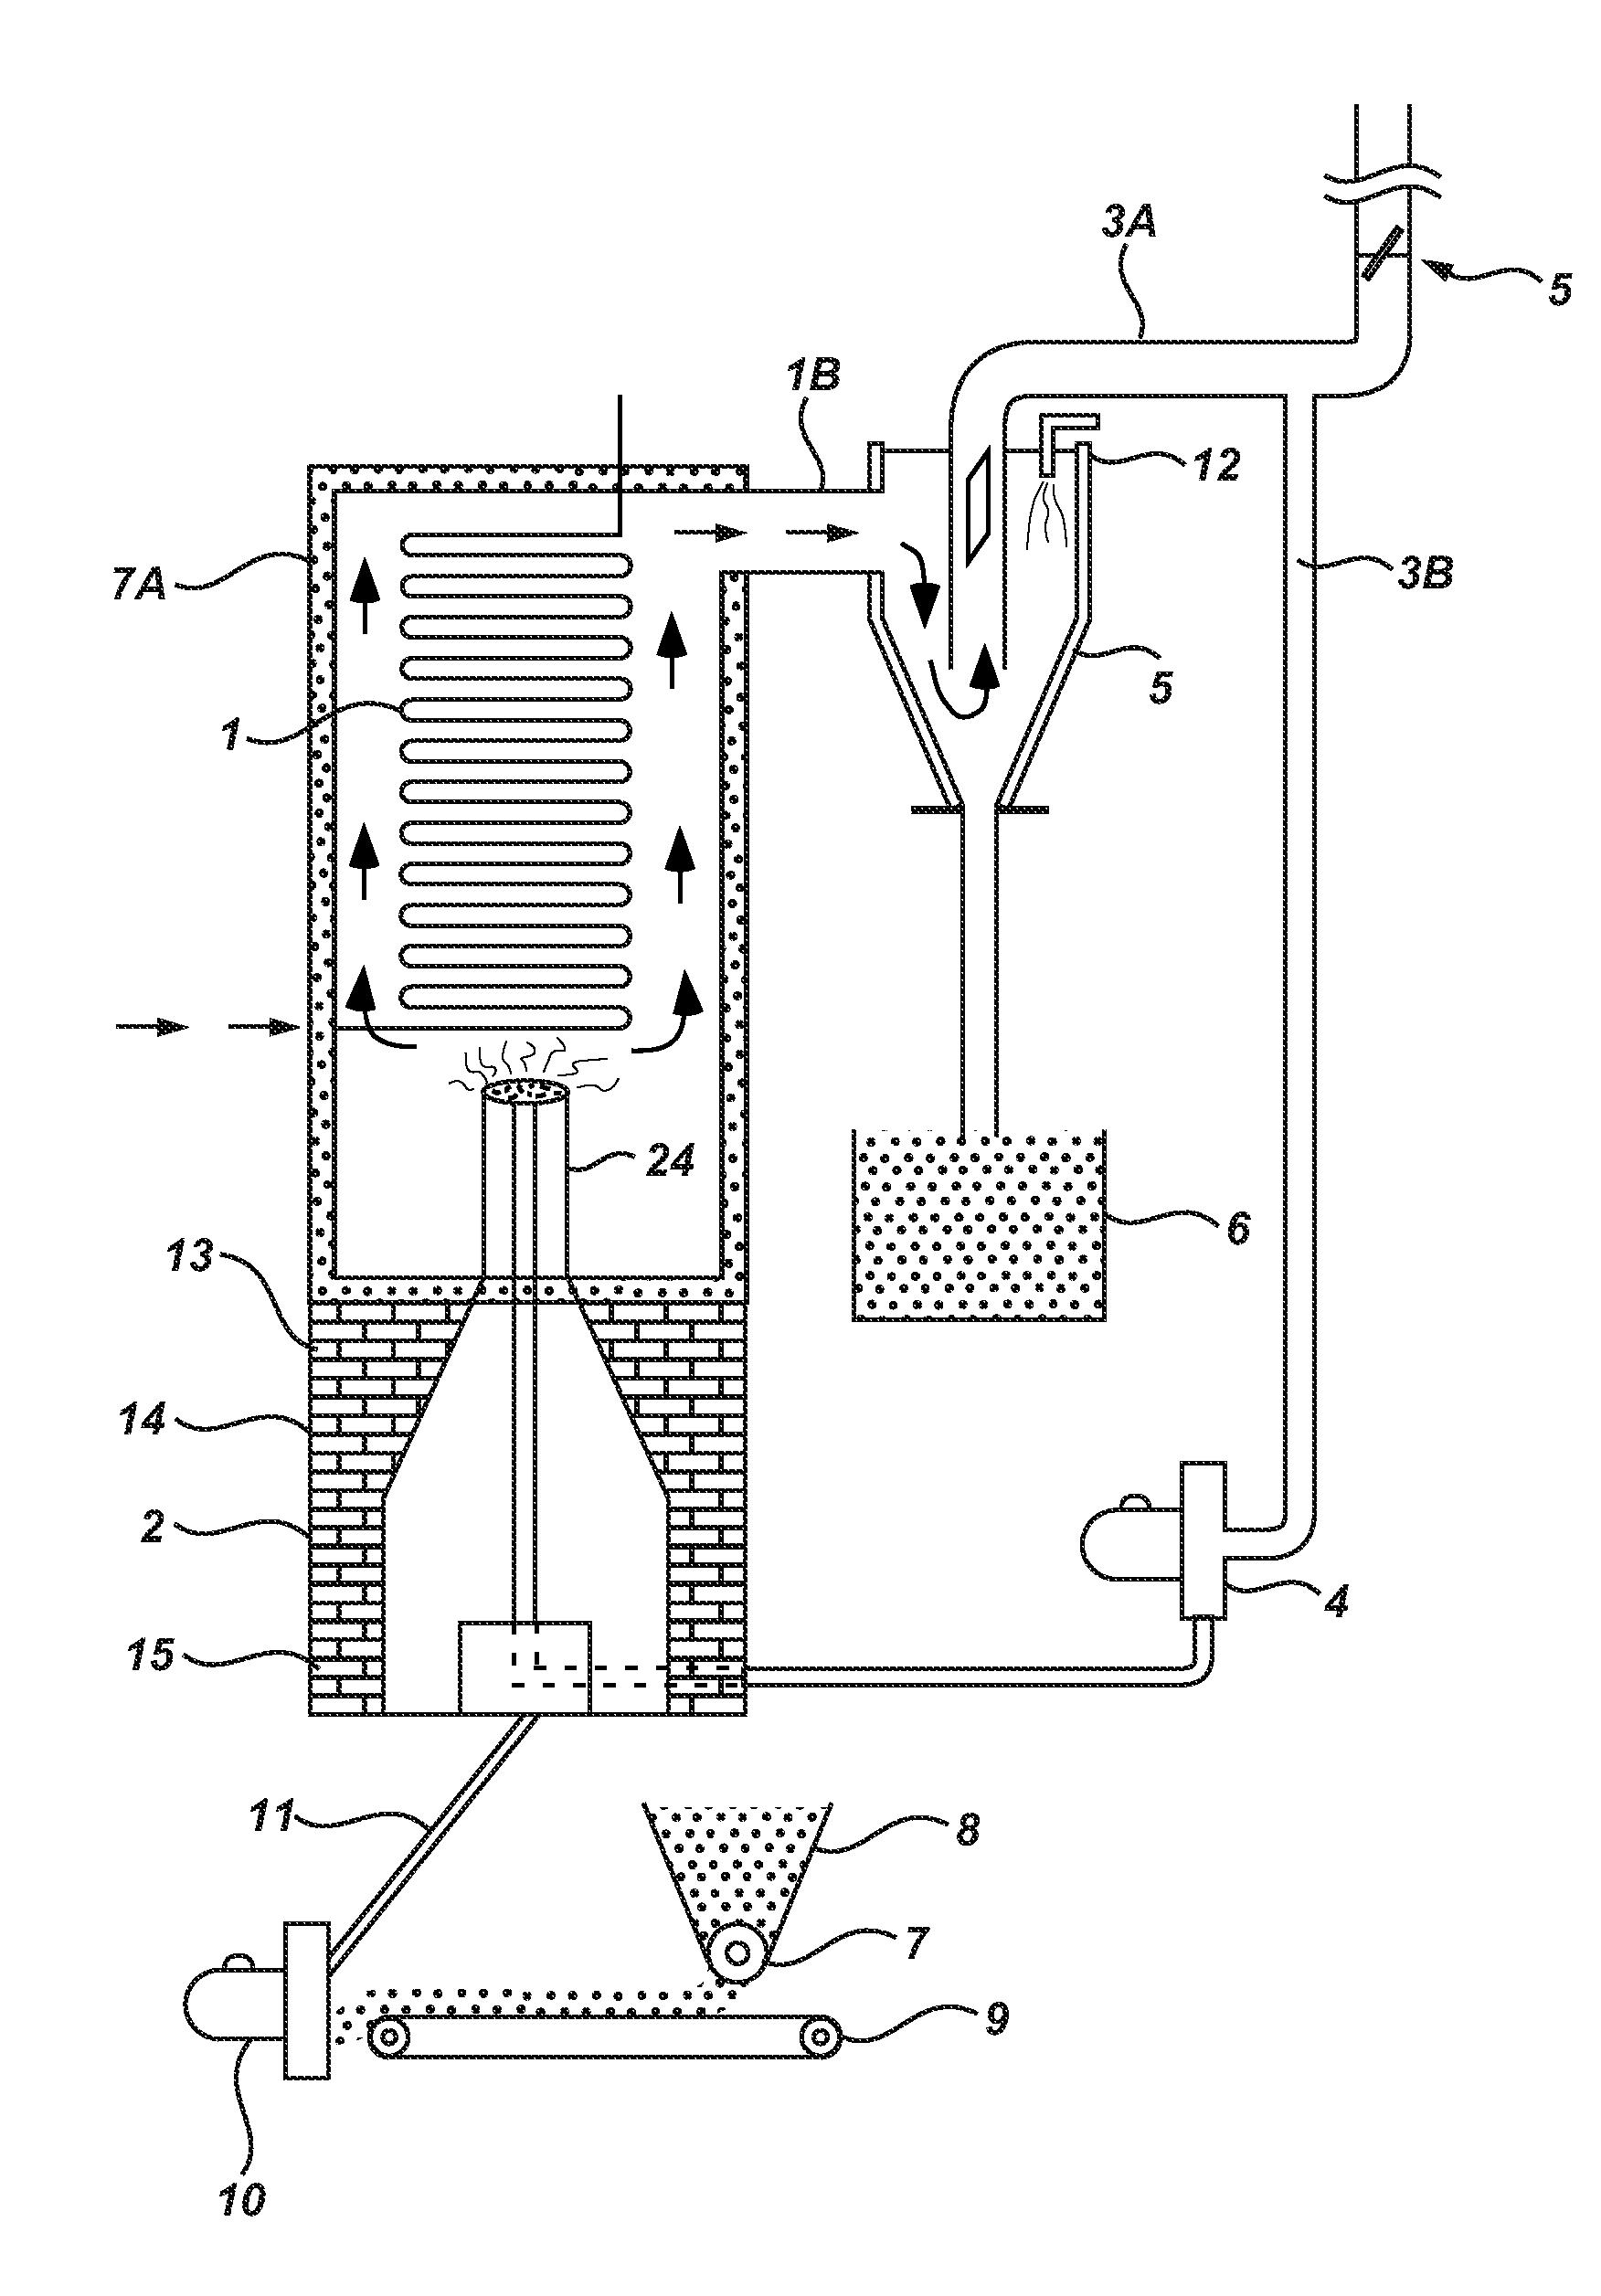 vdo electrical wiring diagram color code vdo wiring diagram free